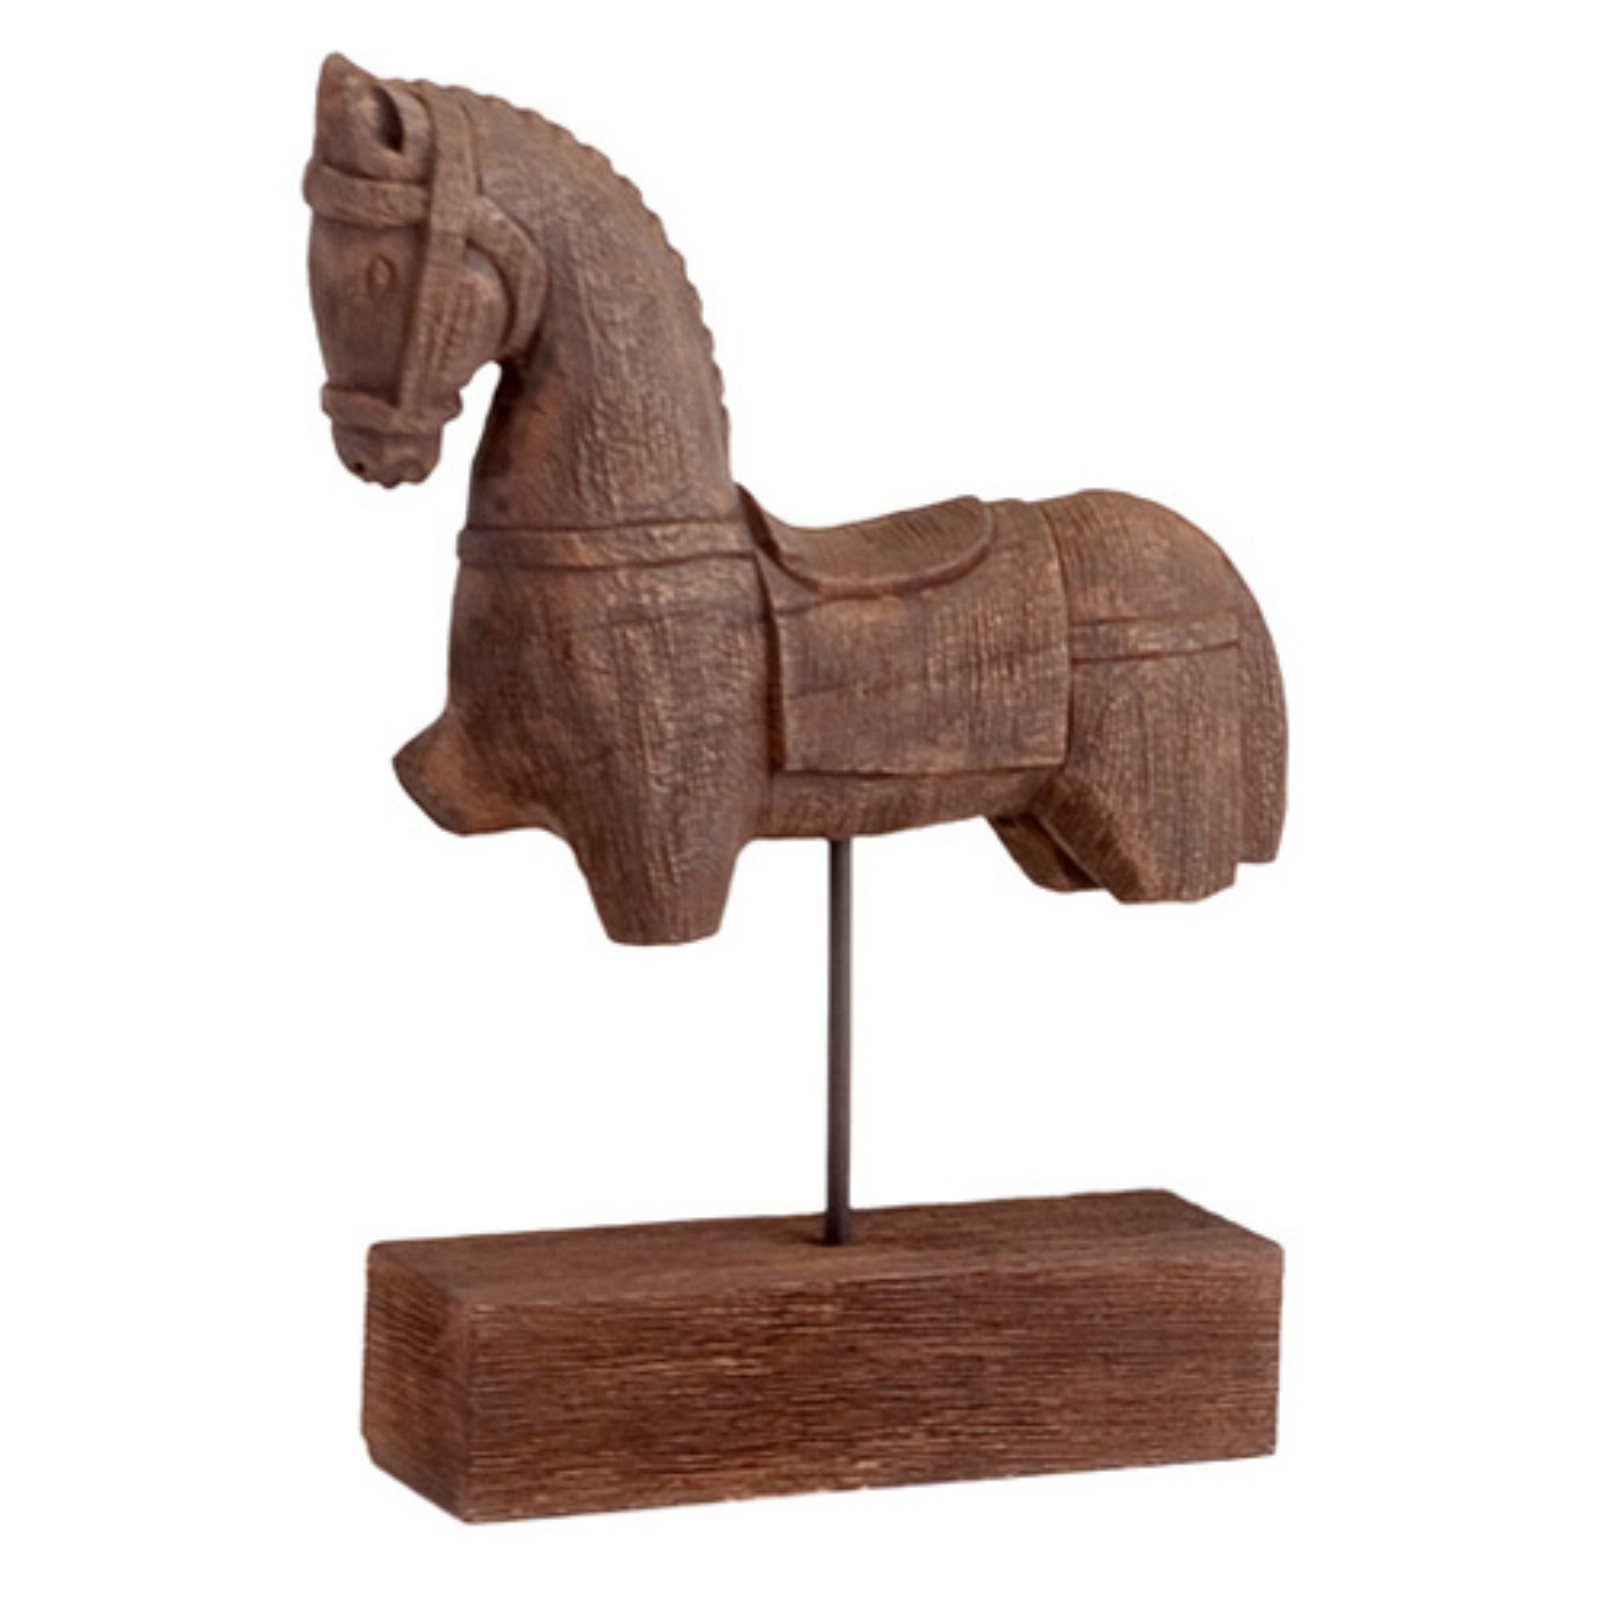 Modern Day Accents Siglo Trojan Horse Sculpture On Stand Walmart Com Walmart Com